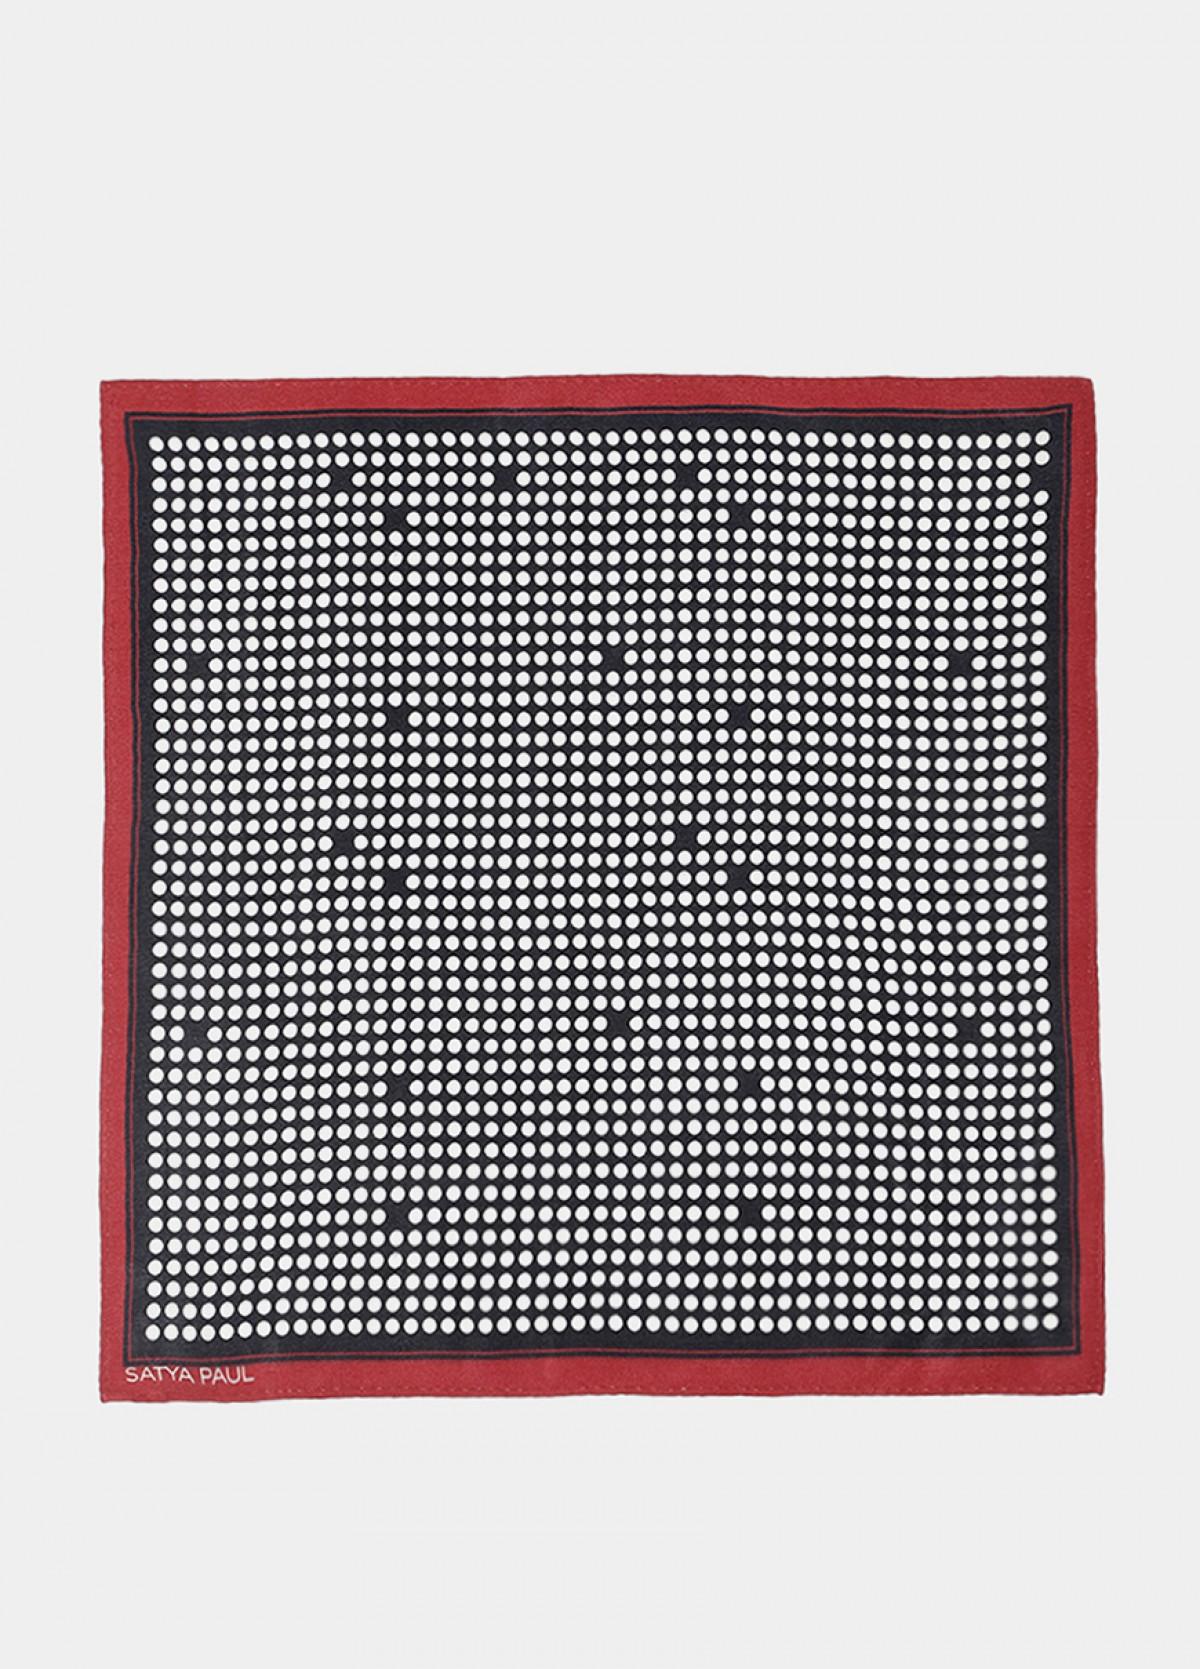 The Furano Silk Satin Pocket Square